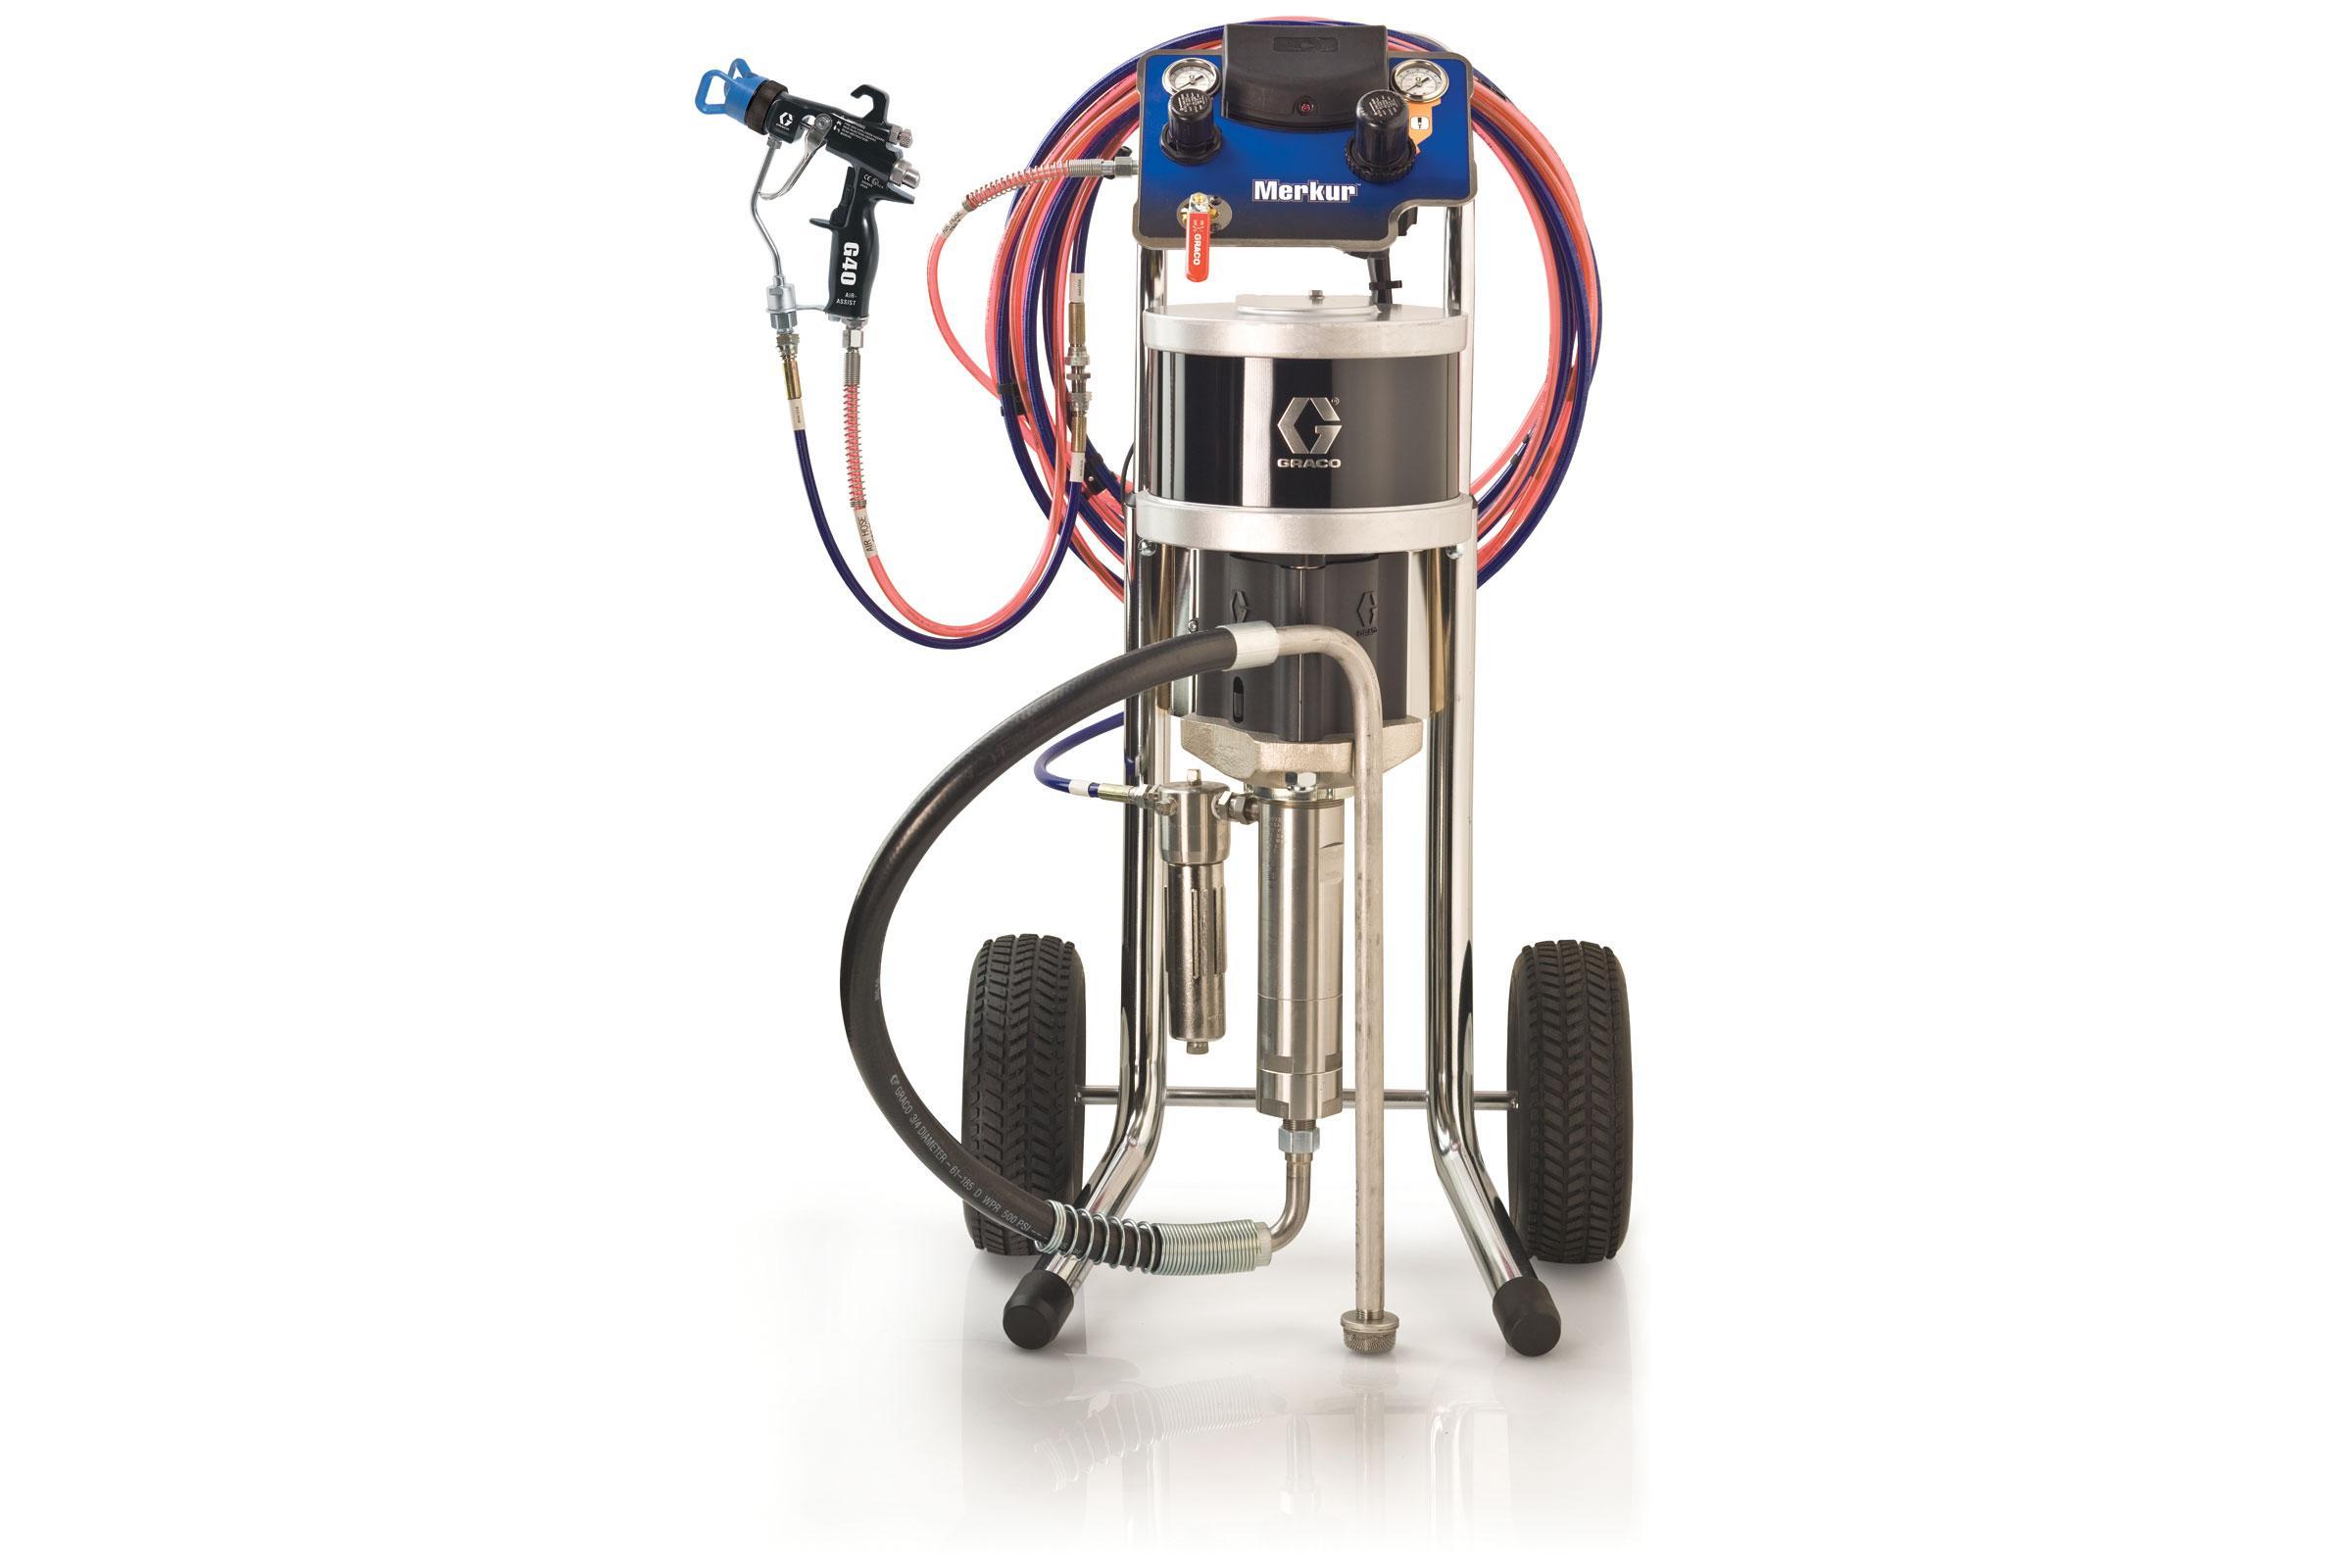 Merkur Air-Assisted Airless Spray System